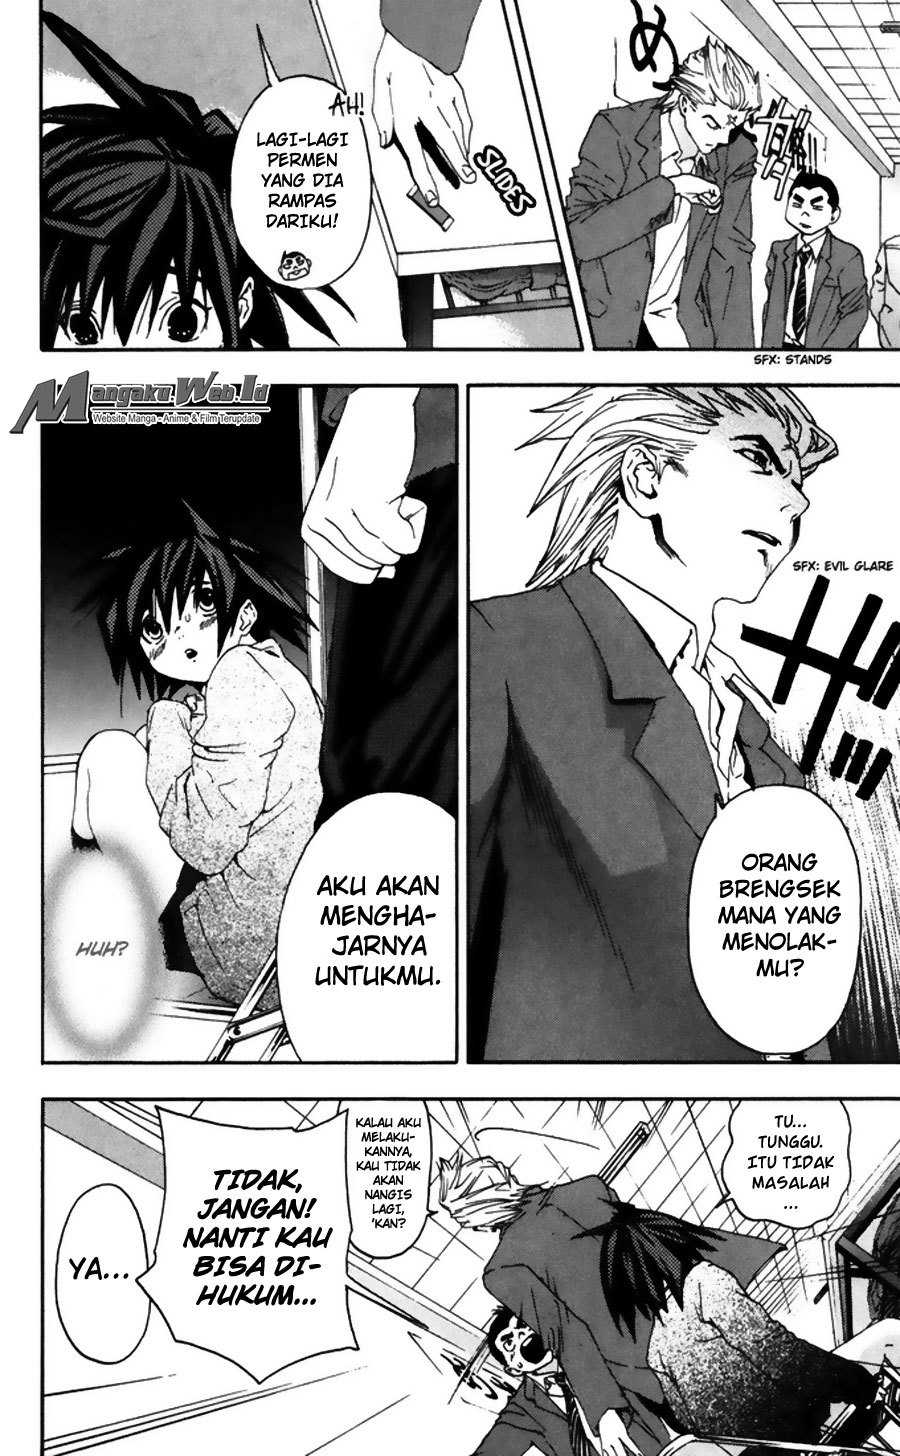 Dilarang COPAS - situs resmi www.mangacanblog.com - Komik ichigo 100 155 - chapter 155 156 Indonesia ichigo 100 155 - chapter 155 Terbaru 15|Baca Manga Komik Indonesia|Mangacan